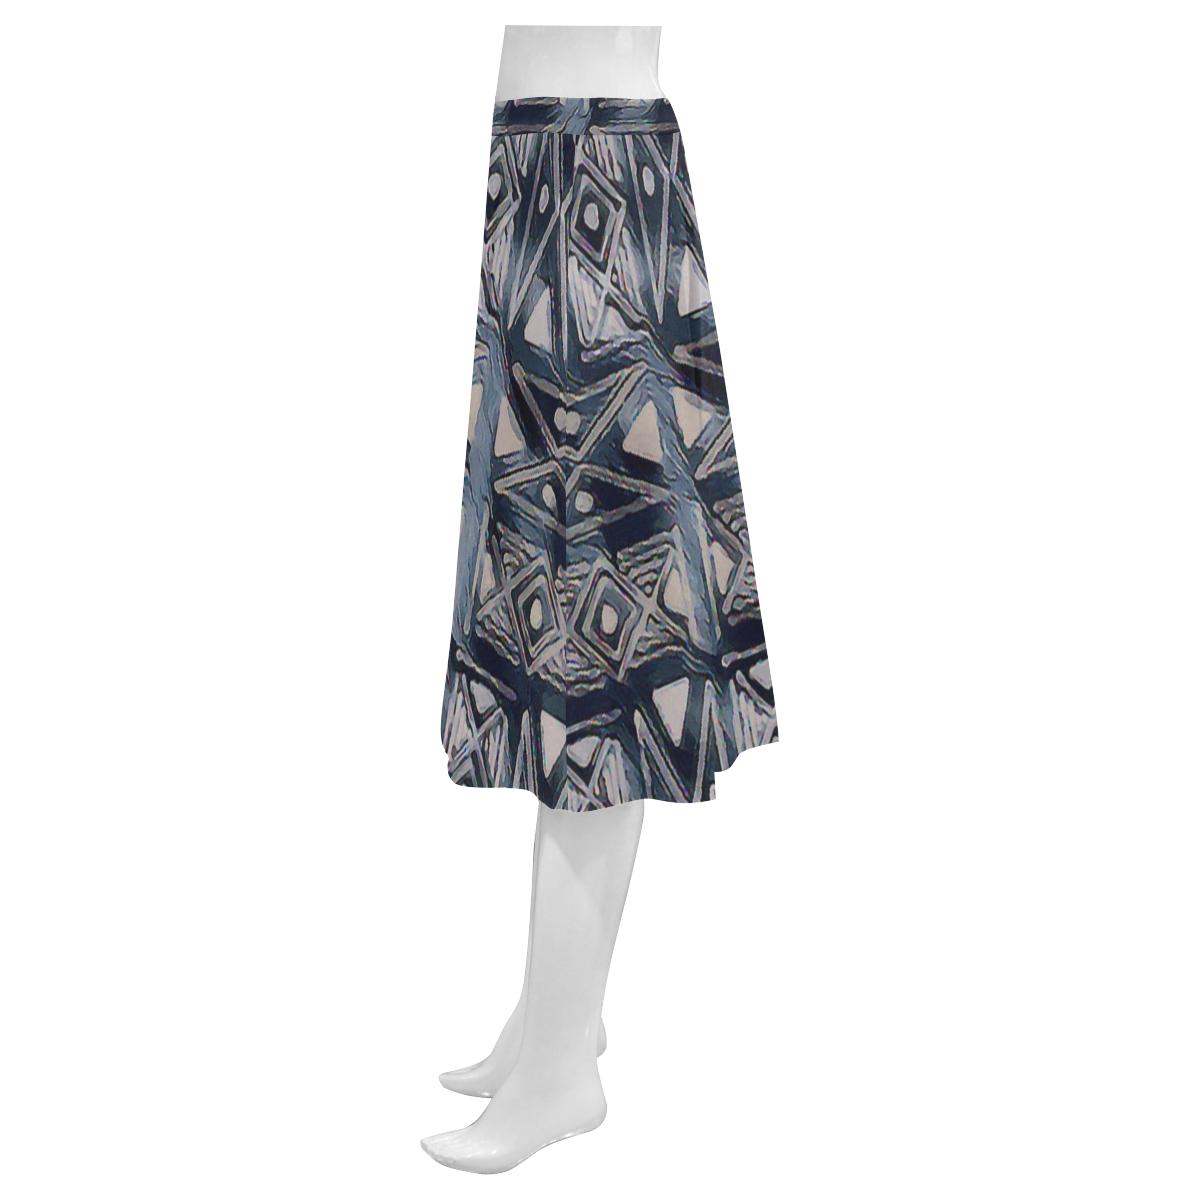 Twist3 Mnemosyne Women's Crepe Skirt (Model D16)